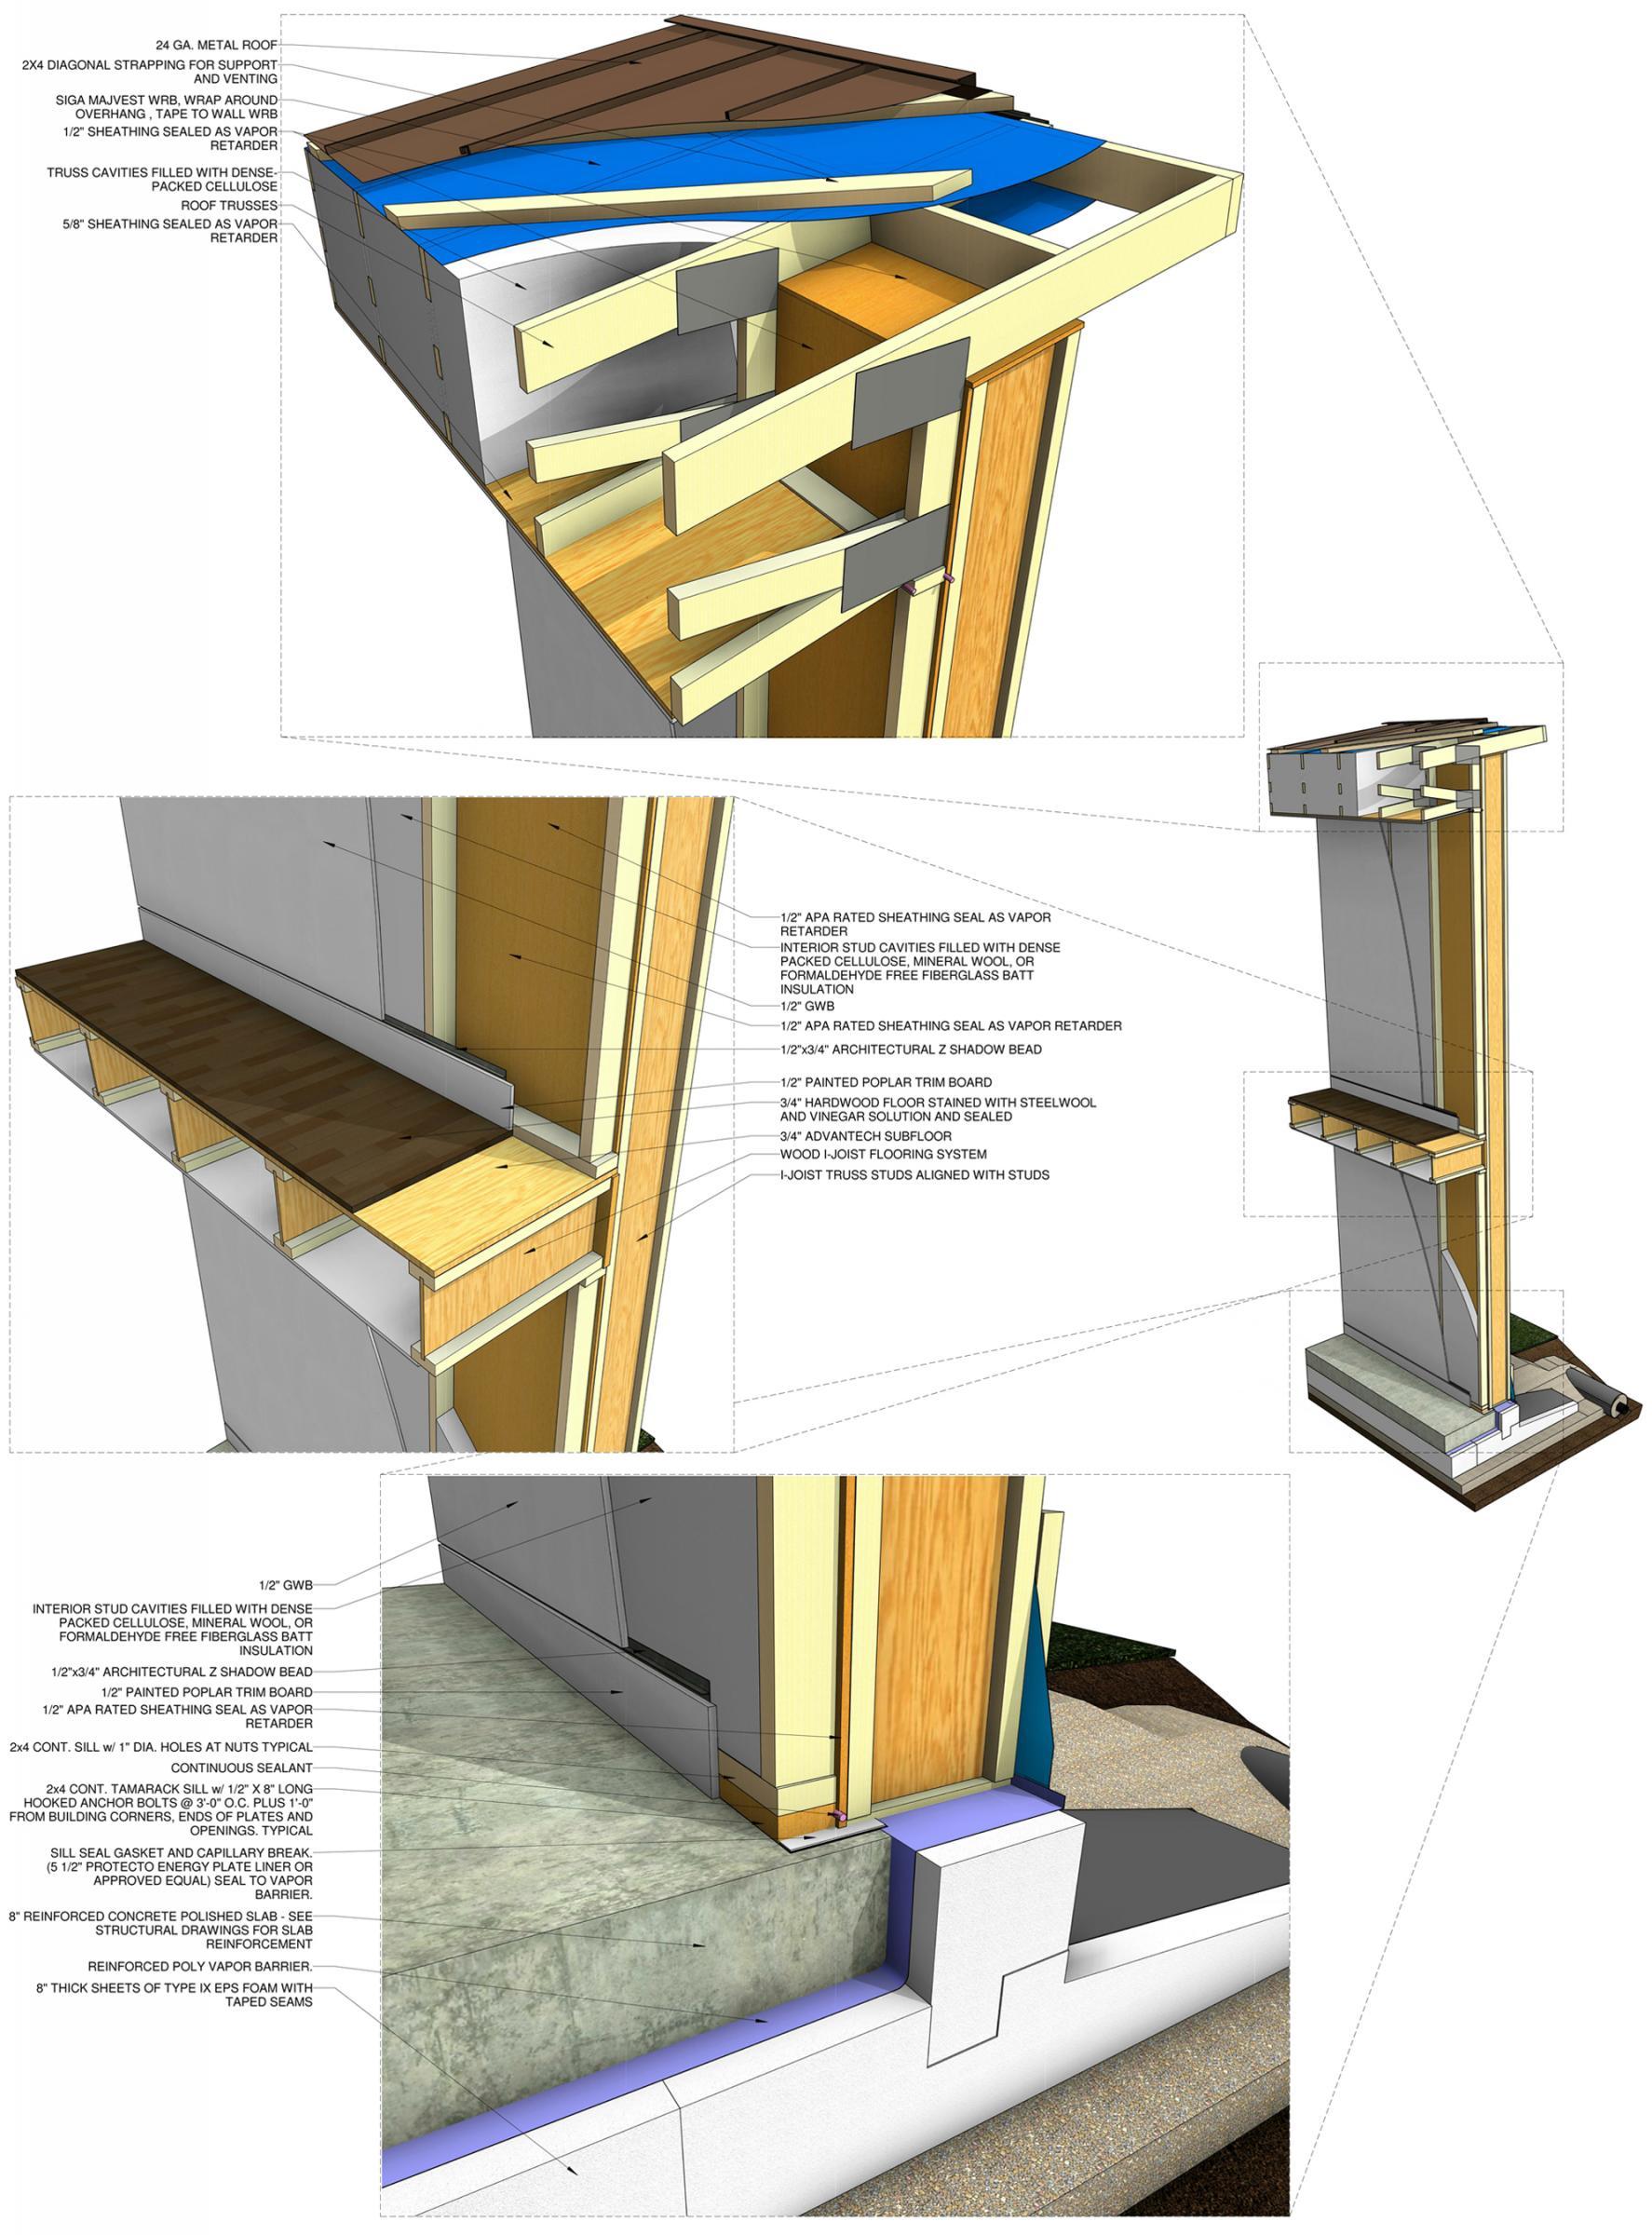 Viridescent Building | NESEA